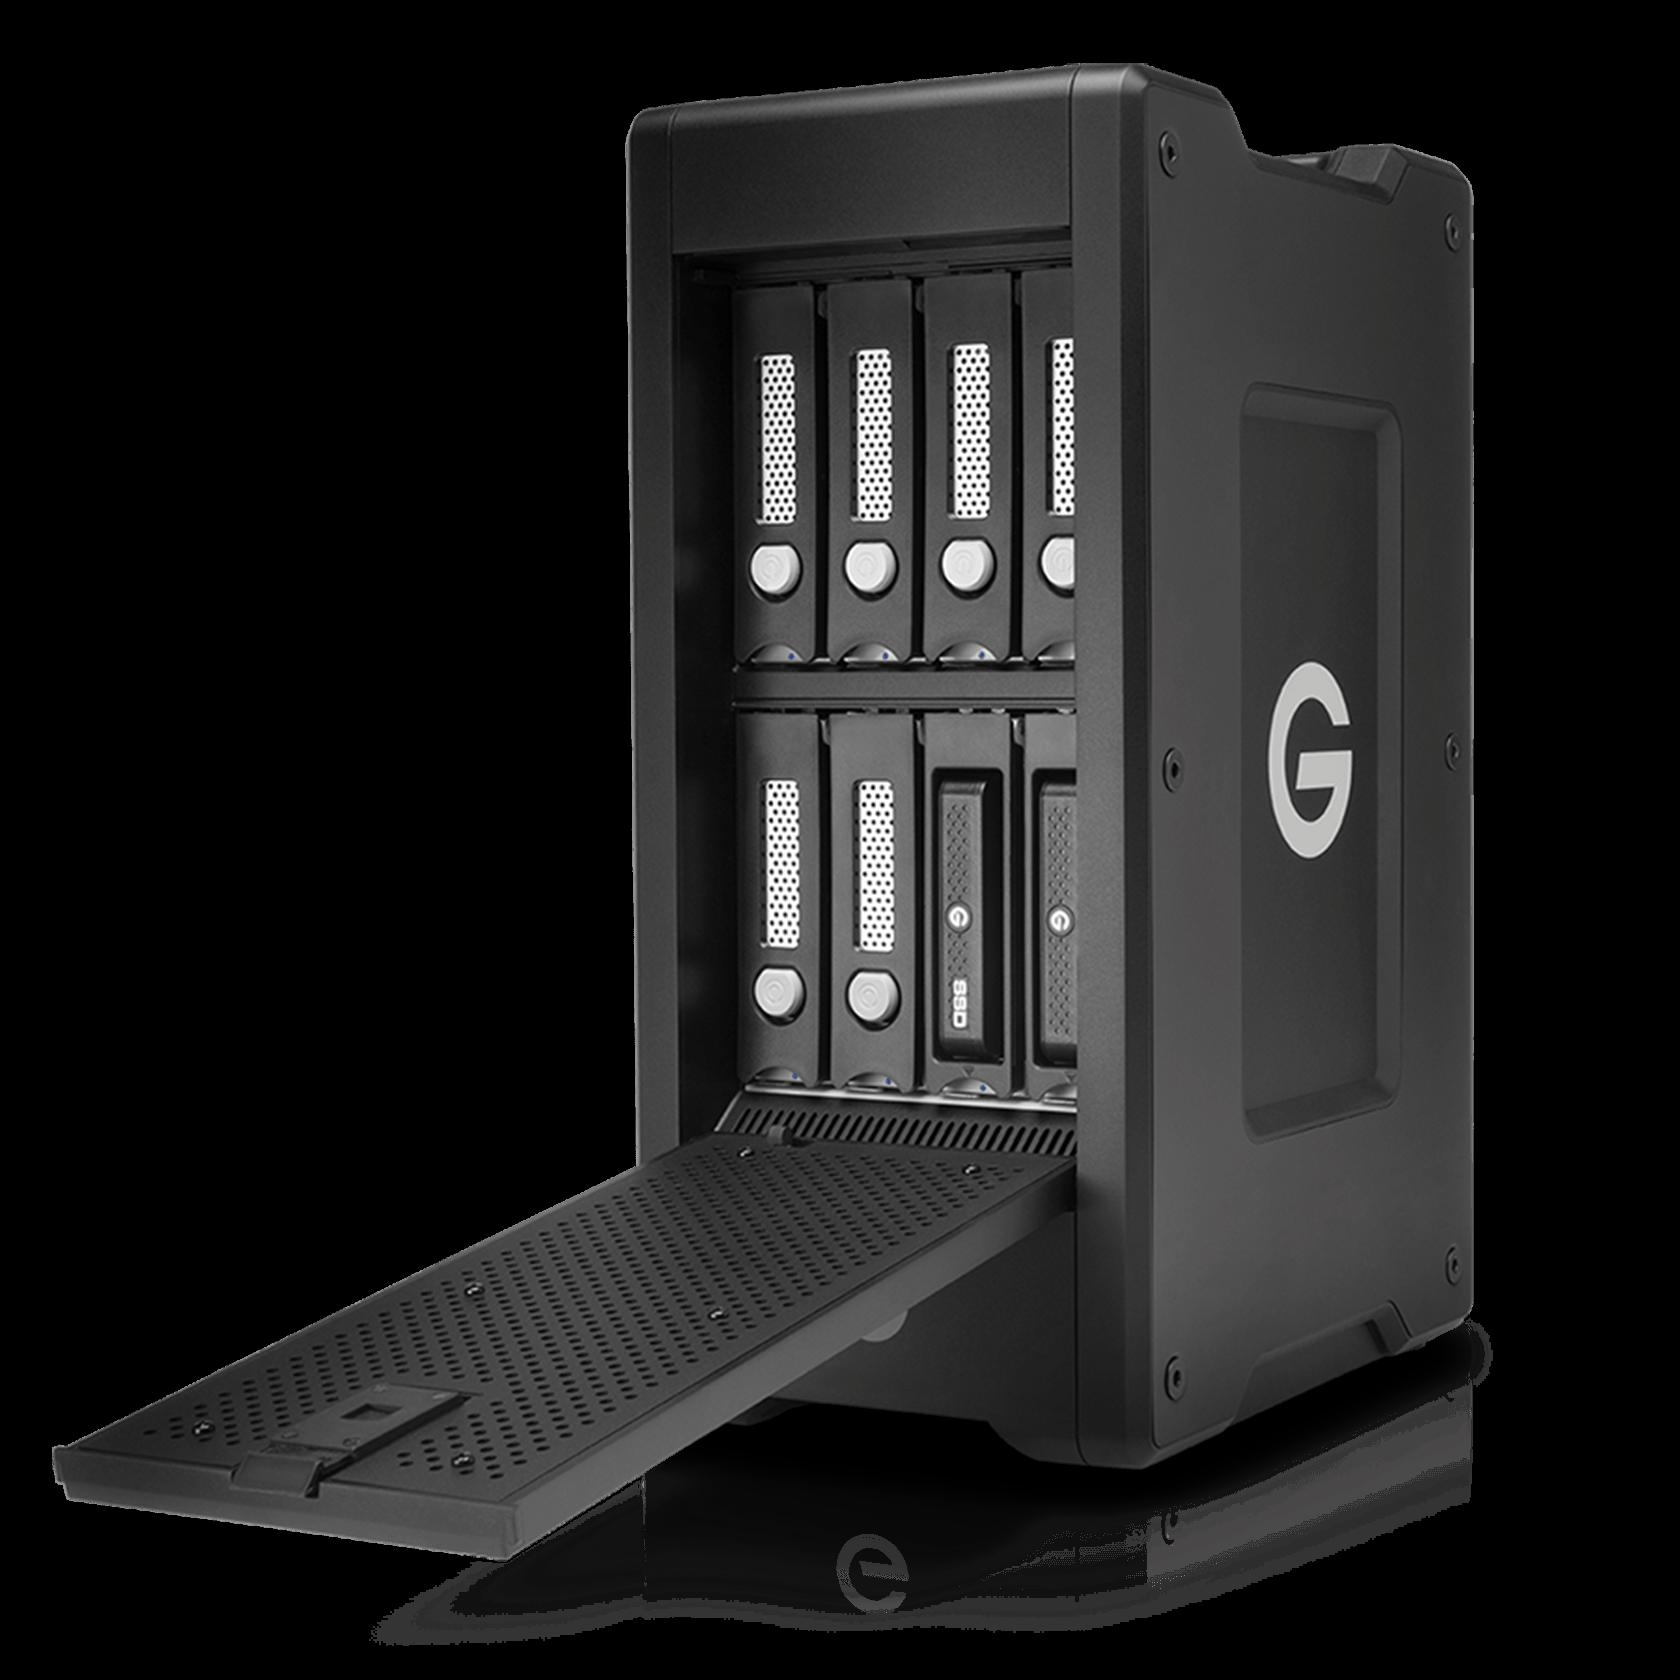 G-Technology 18TB G-SPEED Shuttle XL Thunderbolt 2 w/ ev Series Bay, Black, 8-Bay Storage System - 0G04702